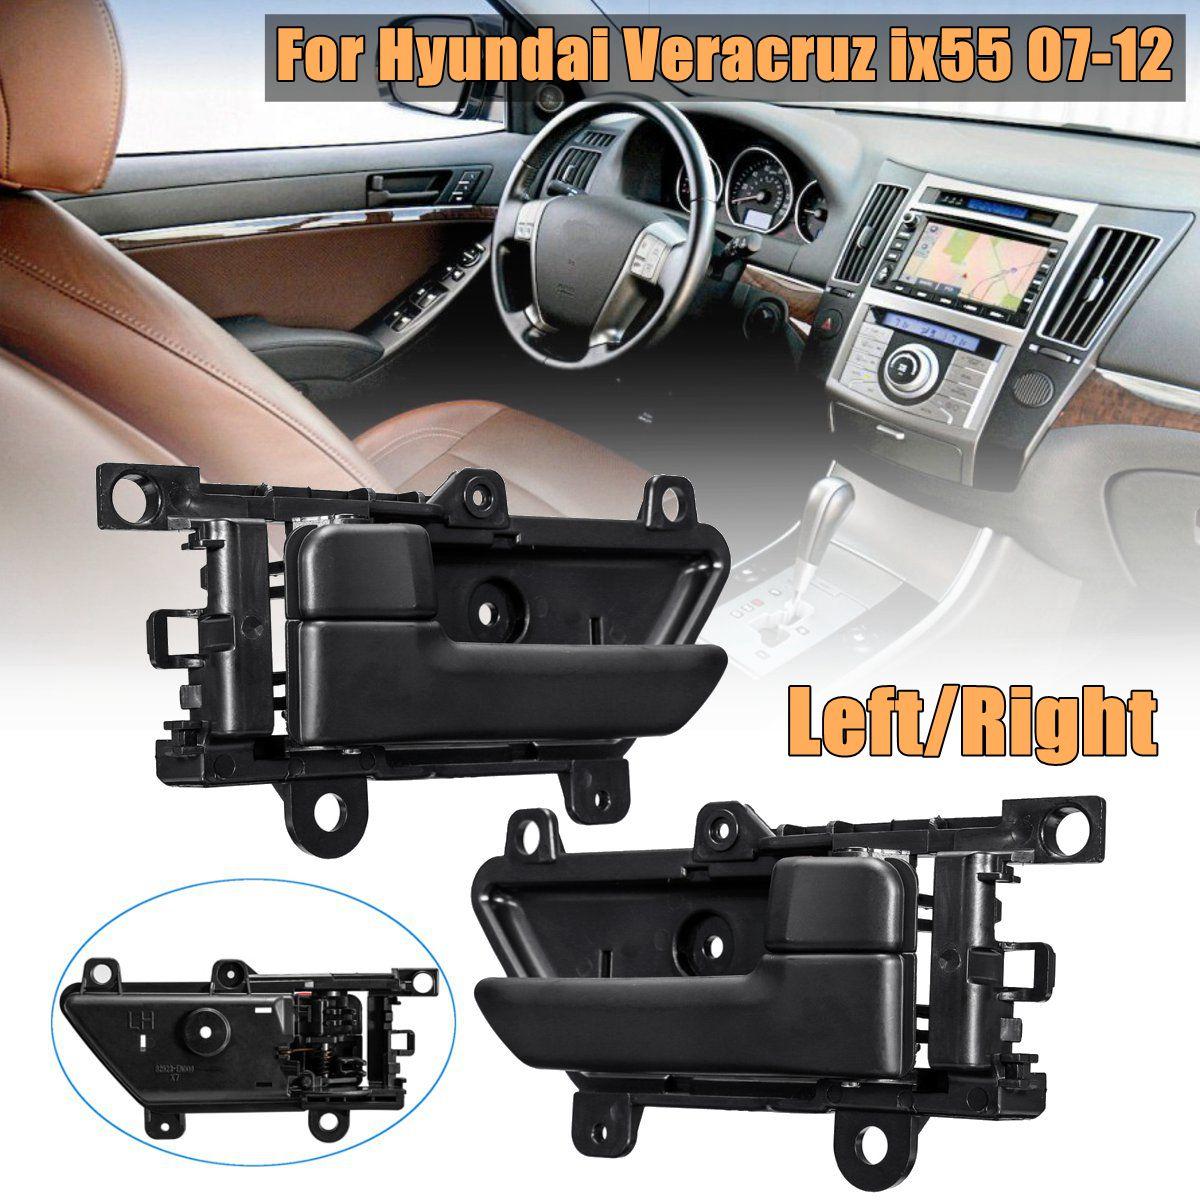 Hyundai Veracruz Interior Door Handle Replacement